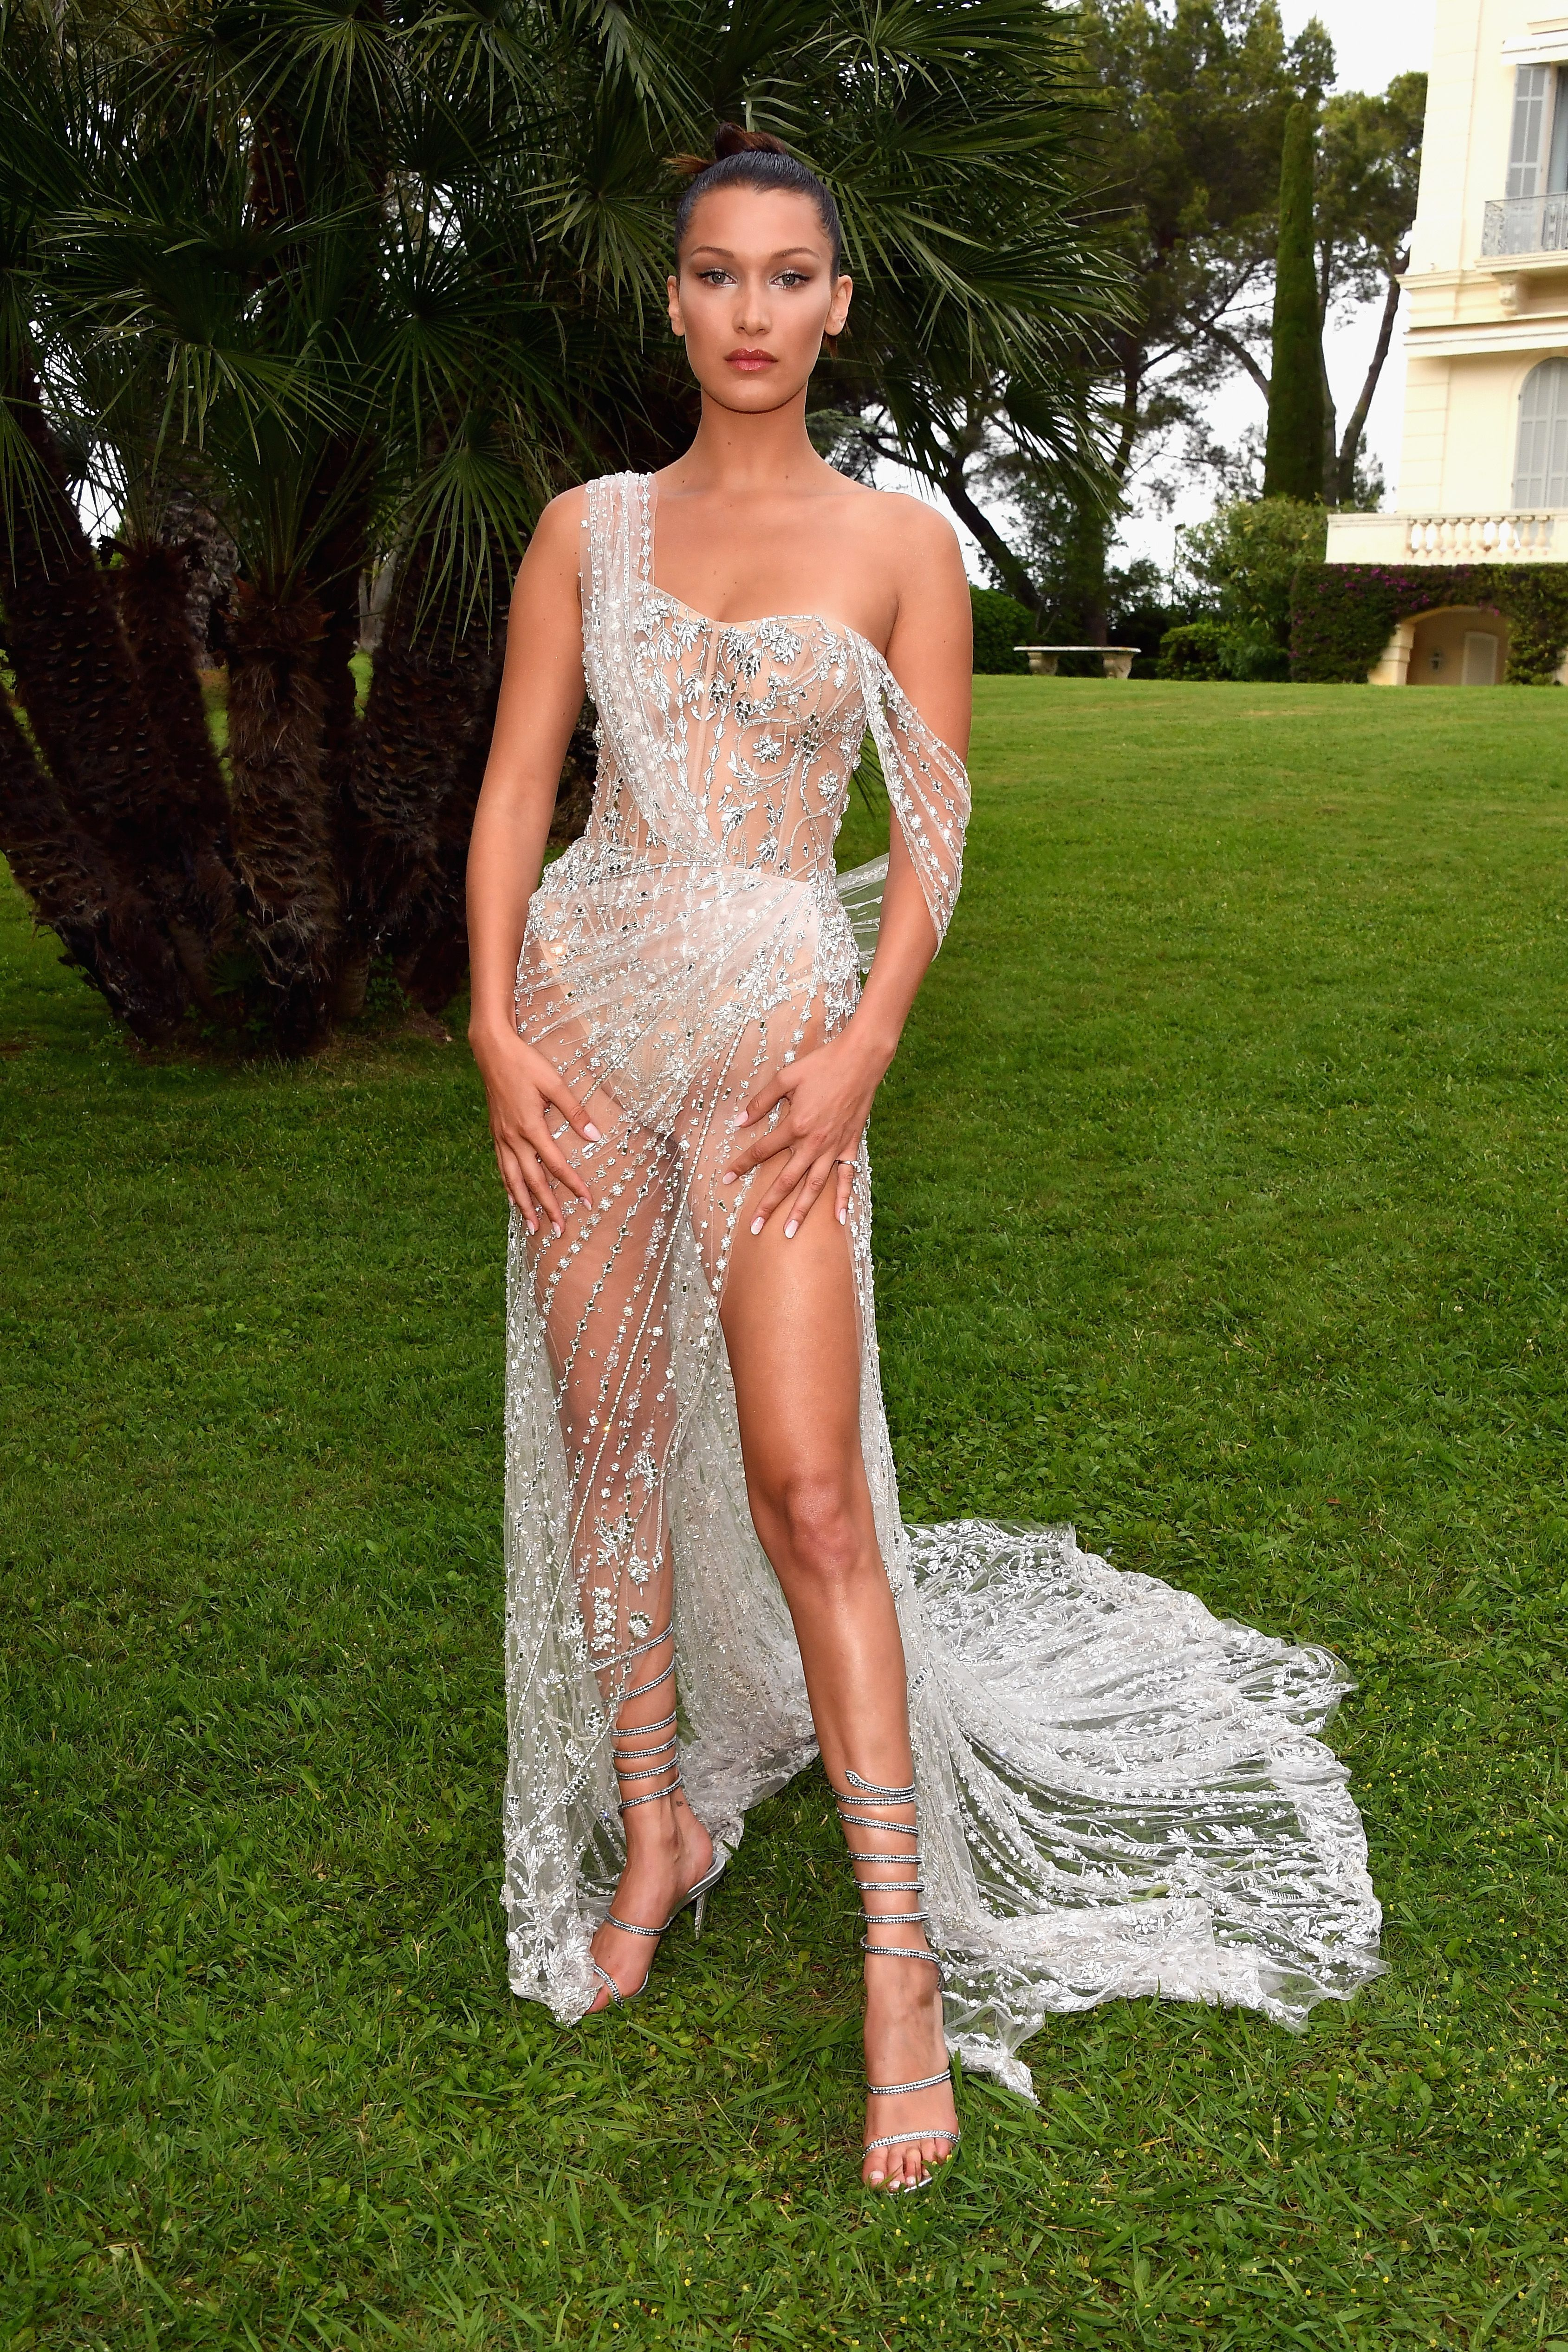 2019 year for women- Amfar cannes gala best dressed celebrities